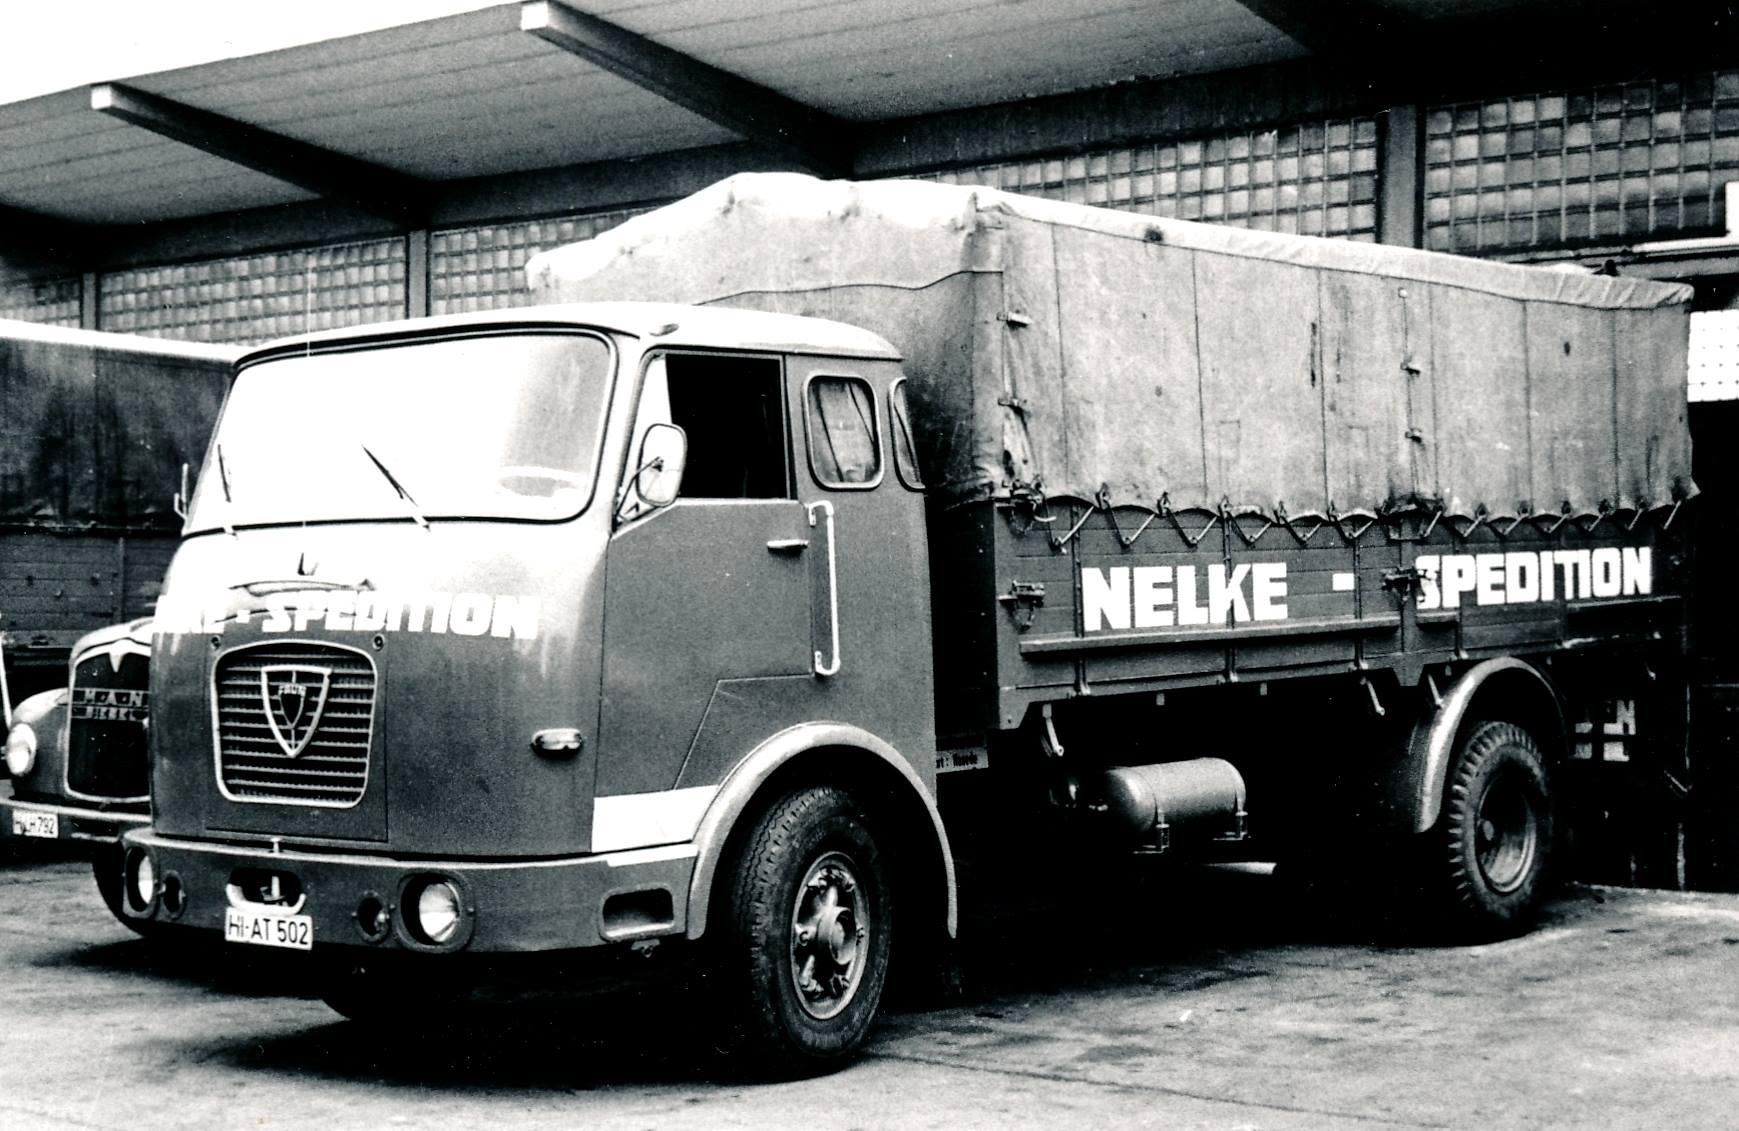 Faun-F-68749-V-Karl-Nelke-Spedition-Hannover